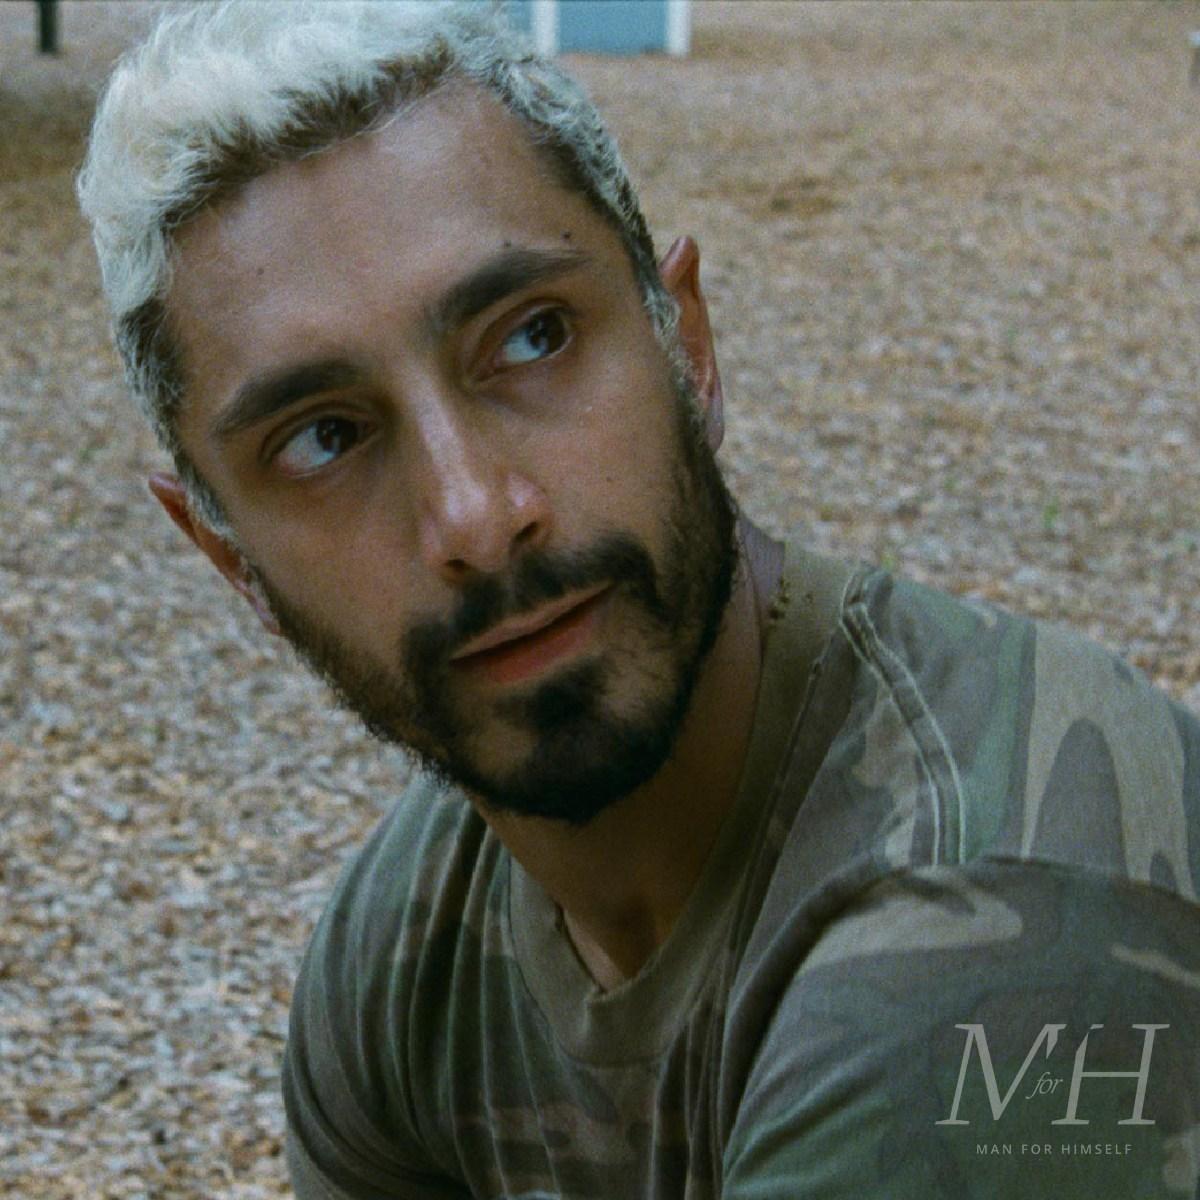 riz-ahmed-bleached-blonde-sound-of-metal-amazon-studios-2021-best-films-great-mens-hair-1200